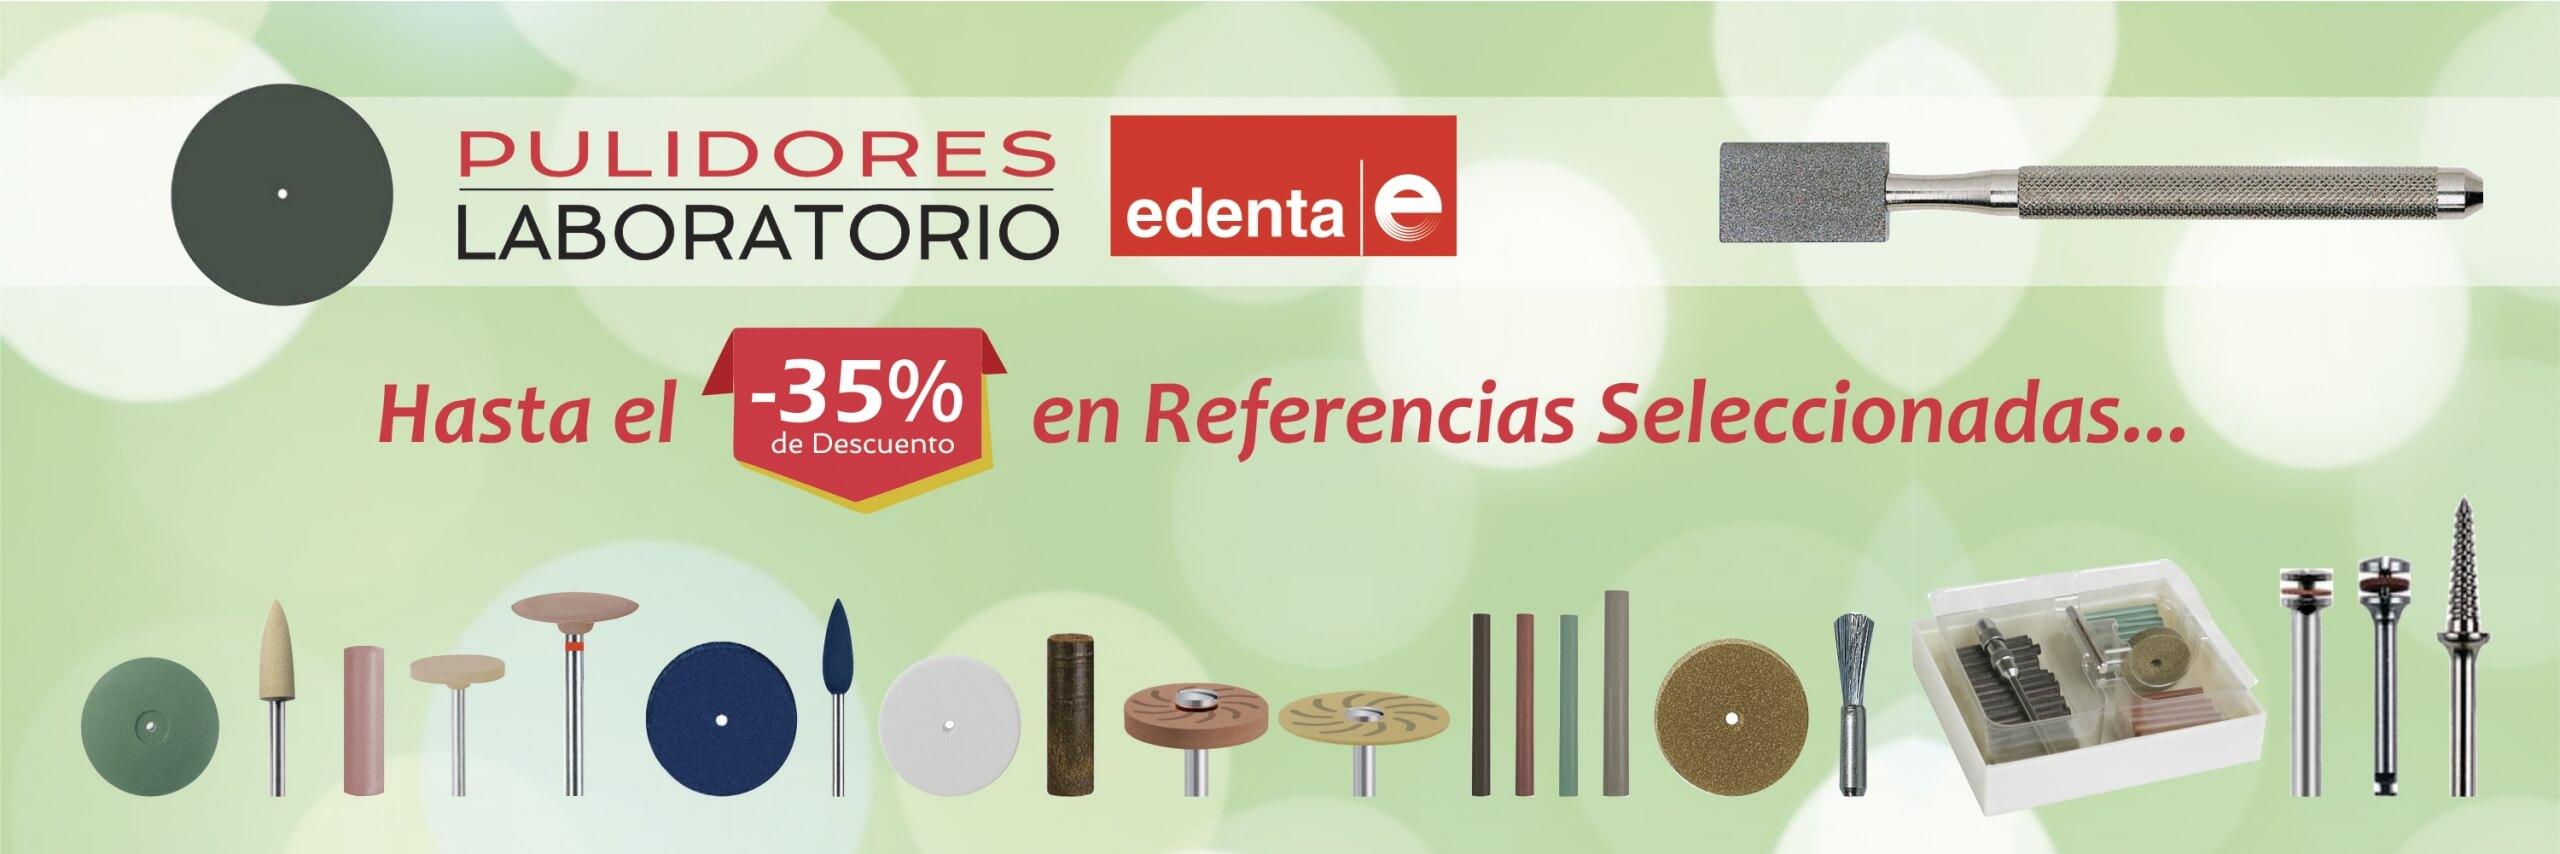 PromoPulidores-edentaRefSelect-2021